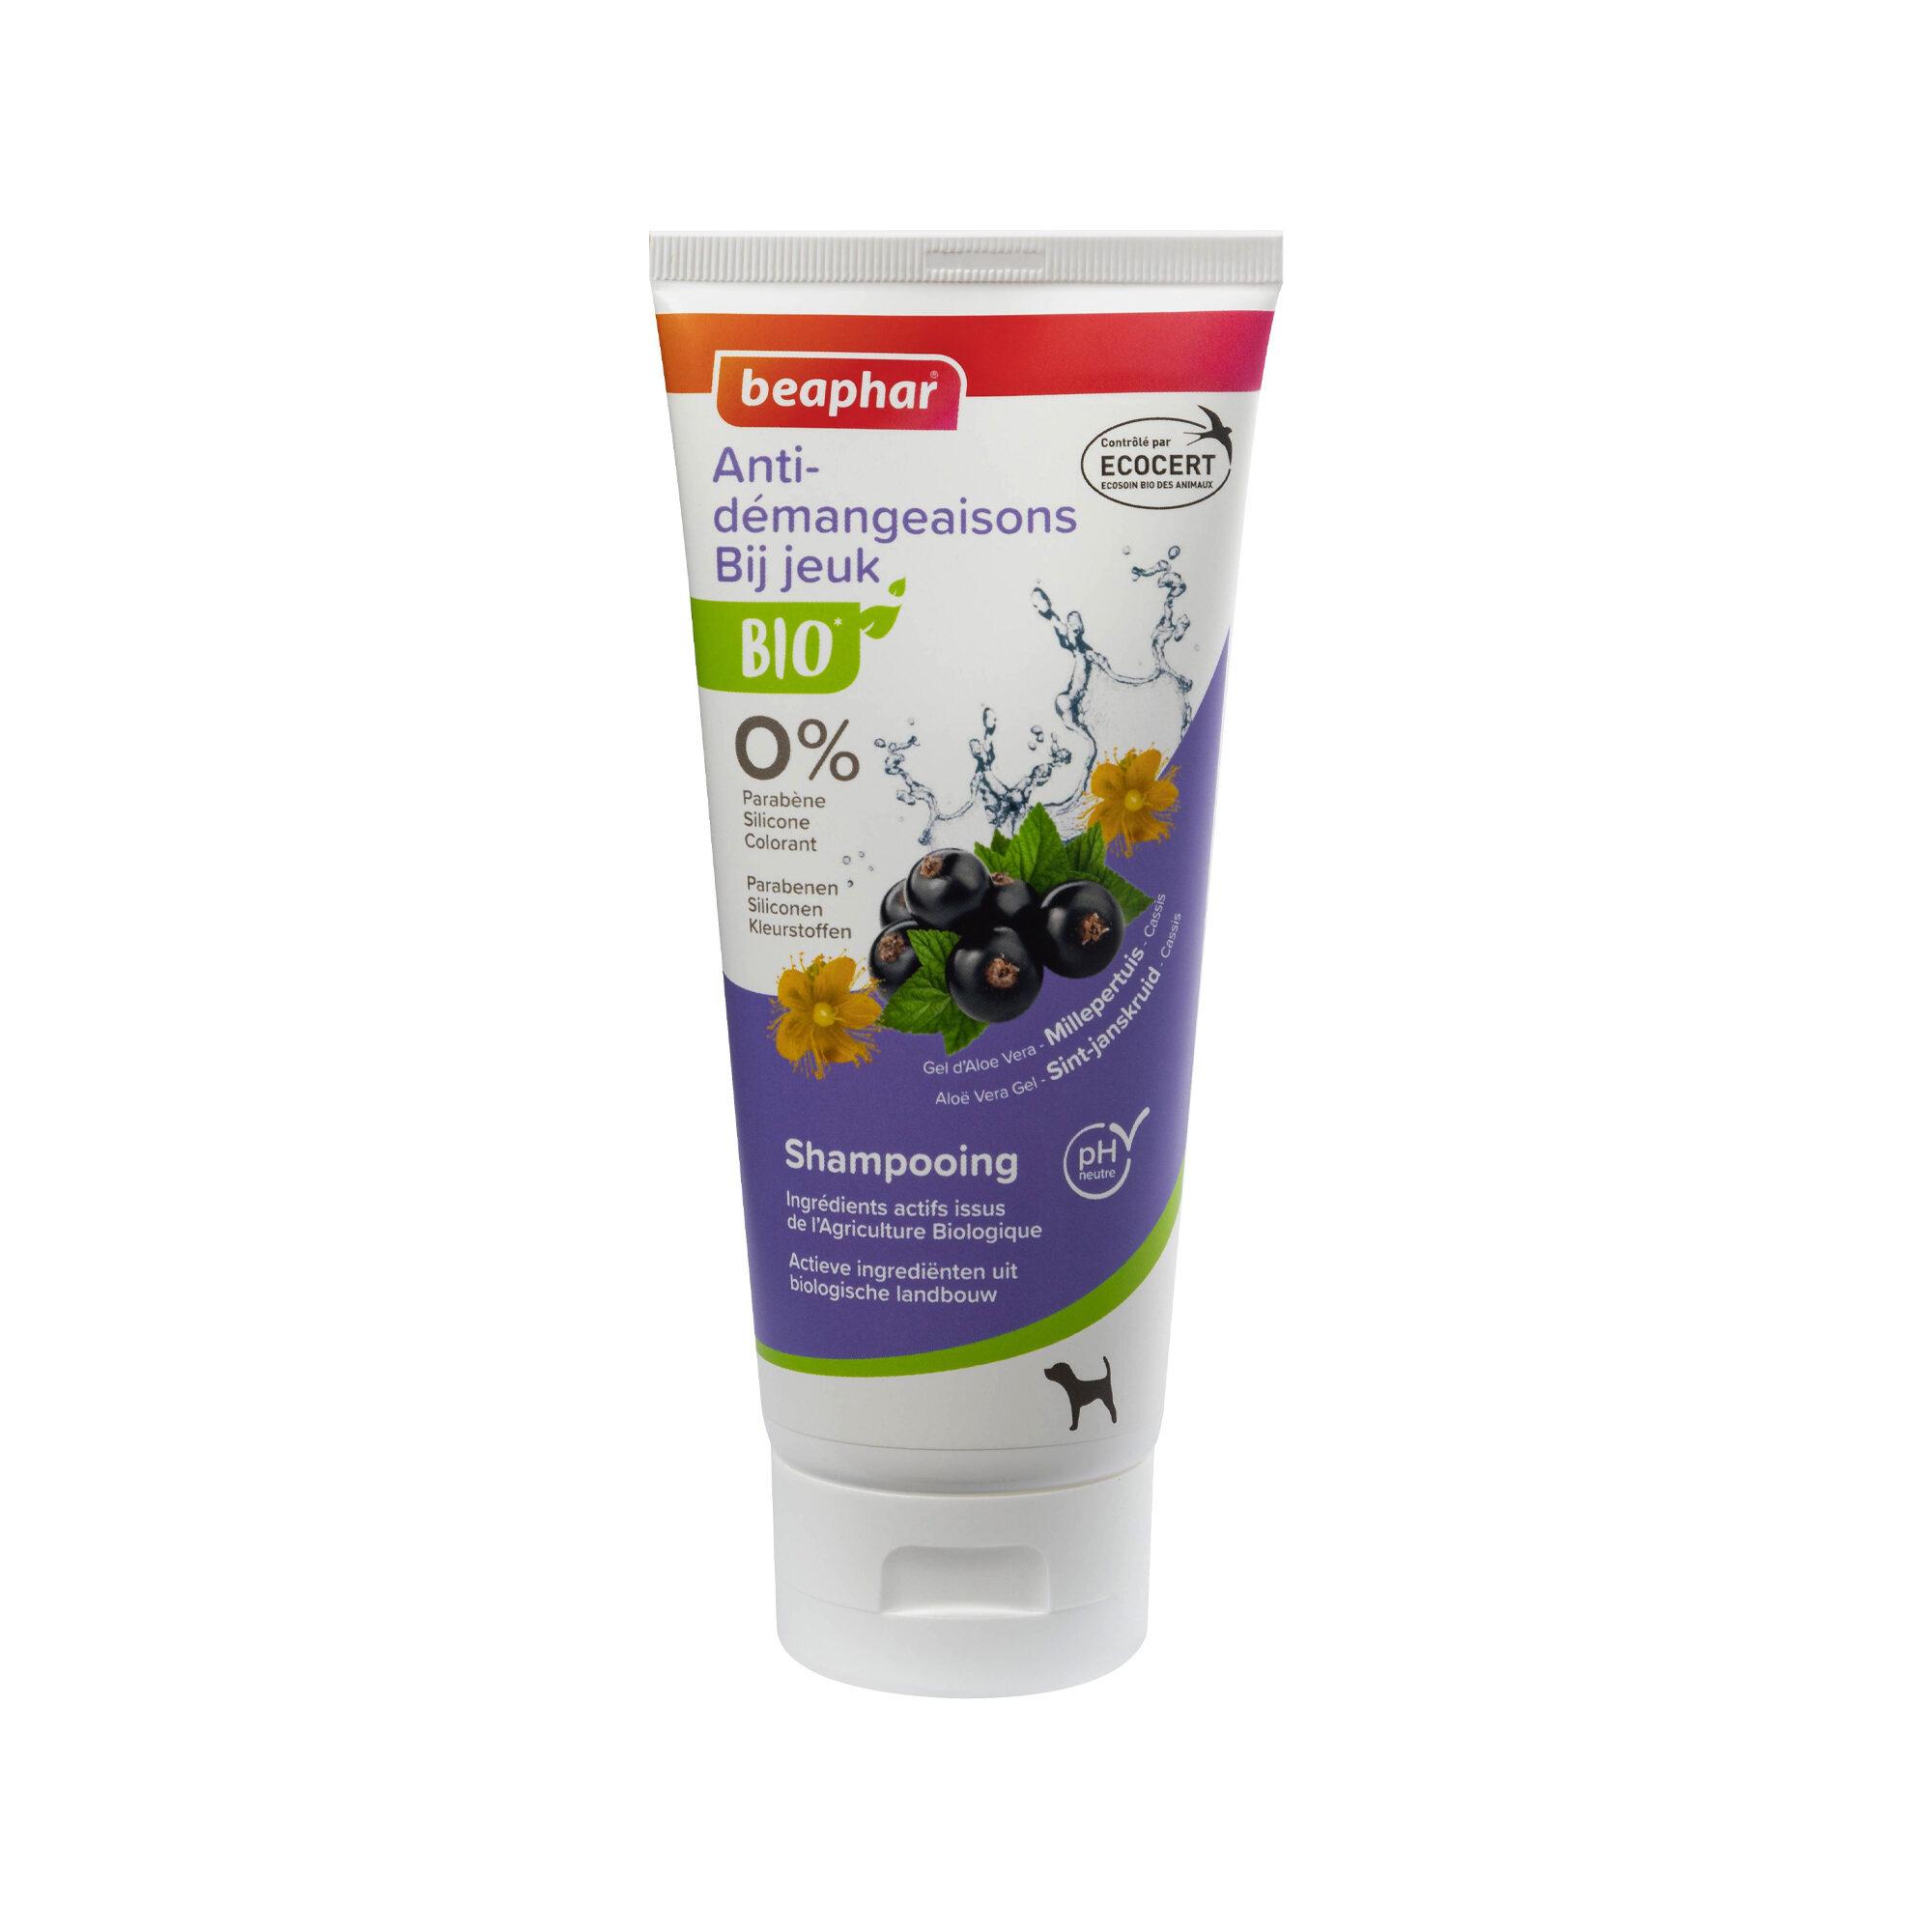 Beaphar Bio - Shampooing pour démangeaisons - Chien - 200 ml